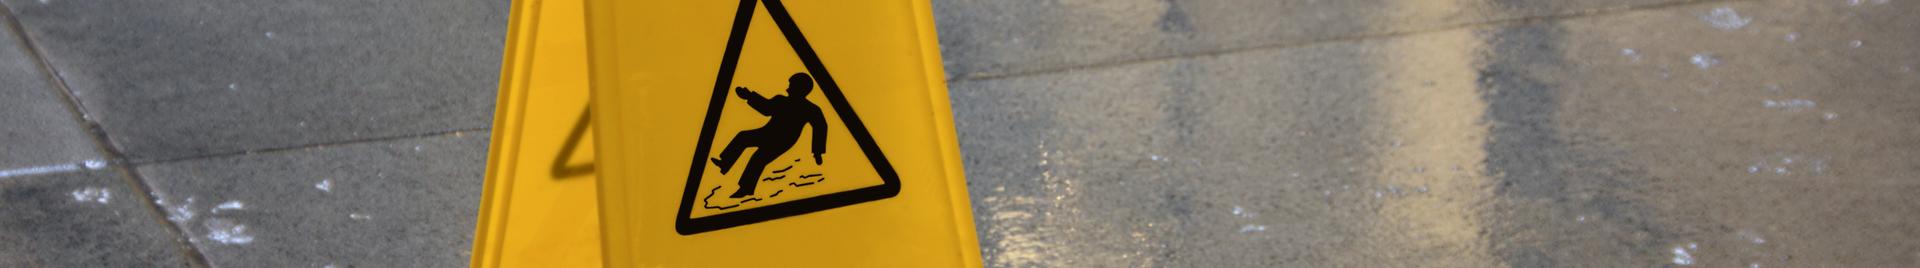 Premises Liability Slip And Fall